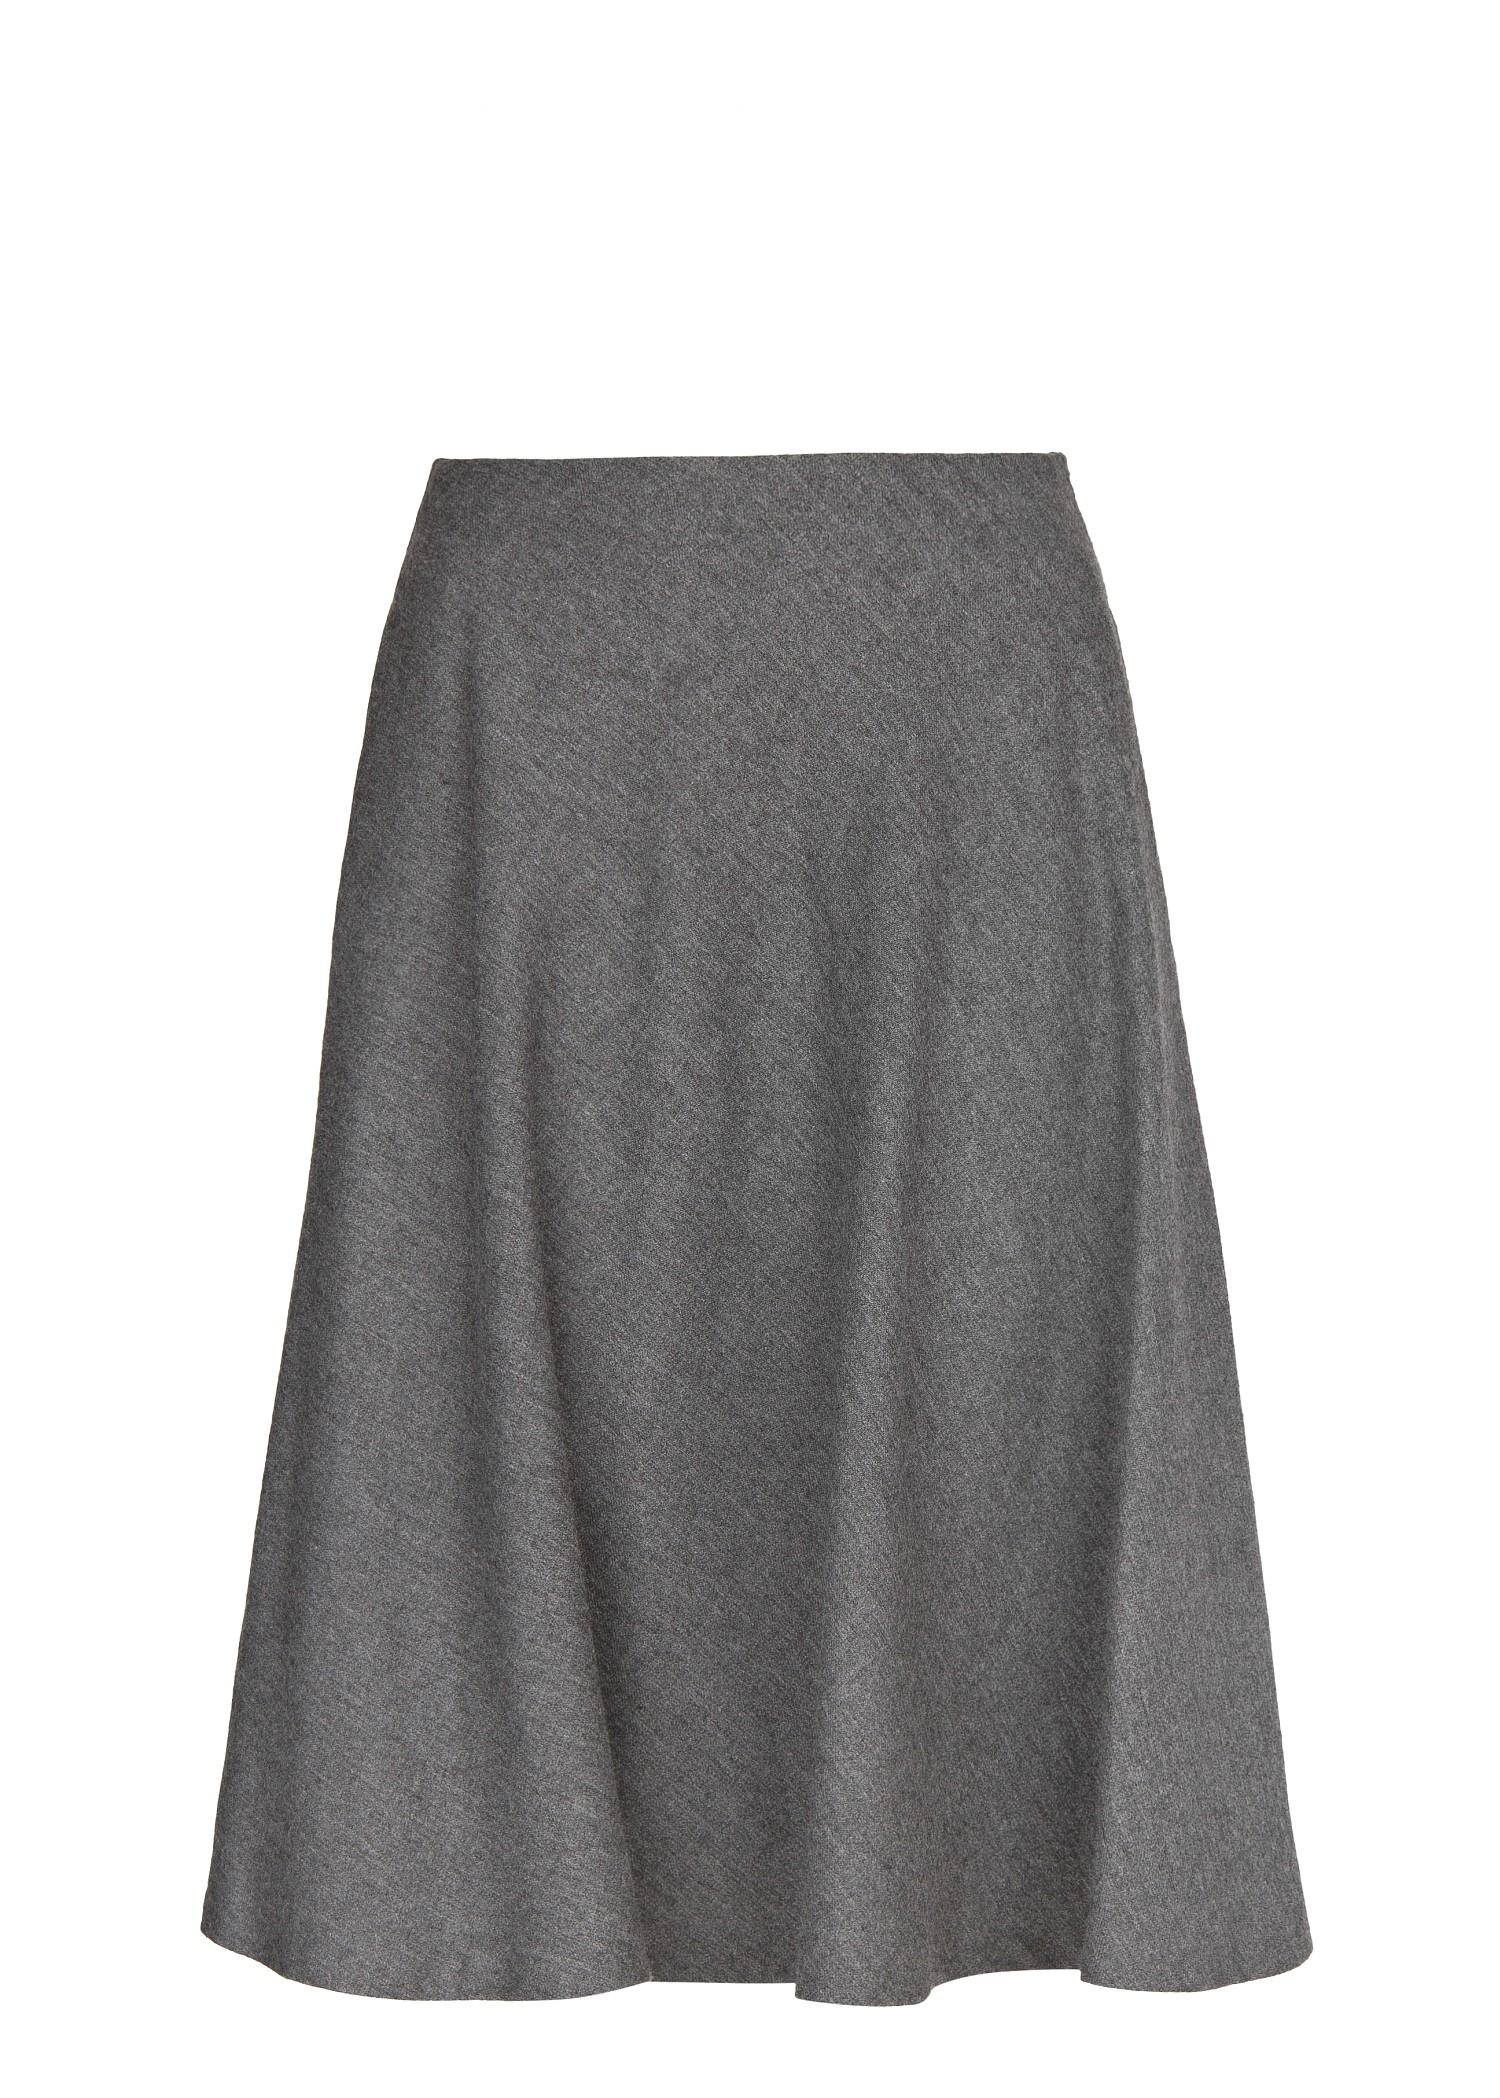 Mango Premium Flared Midi Skirt in Gray | Lyst